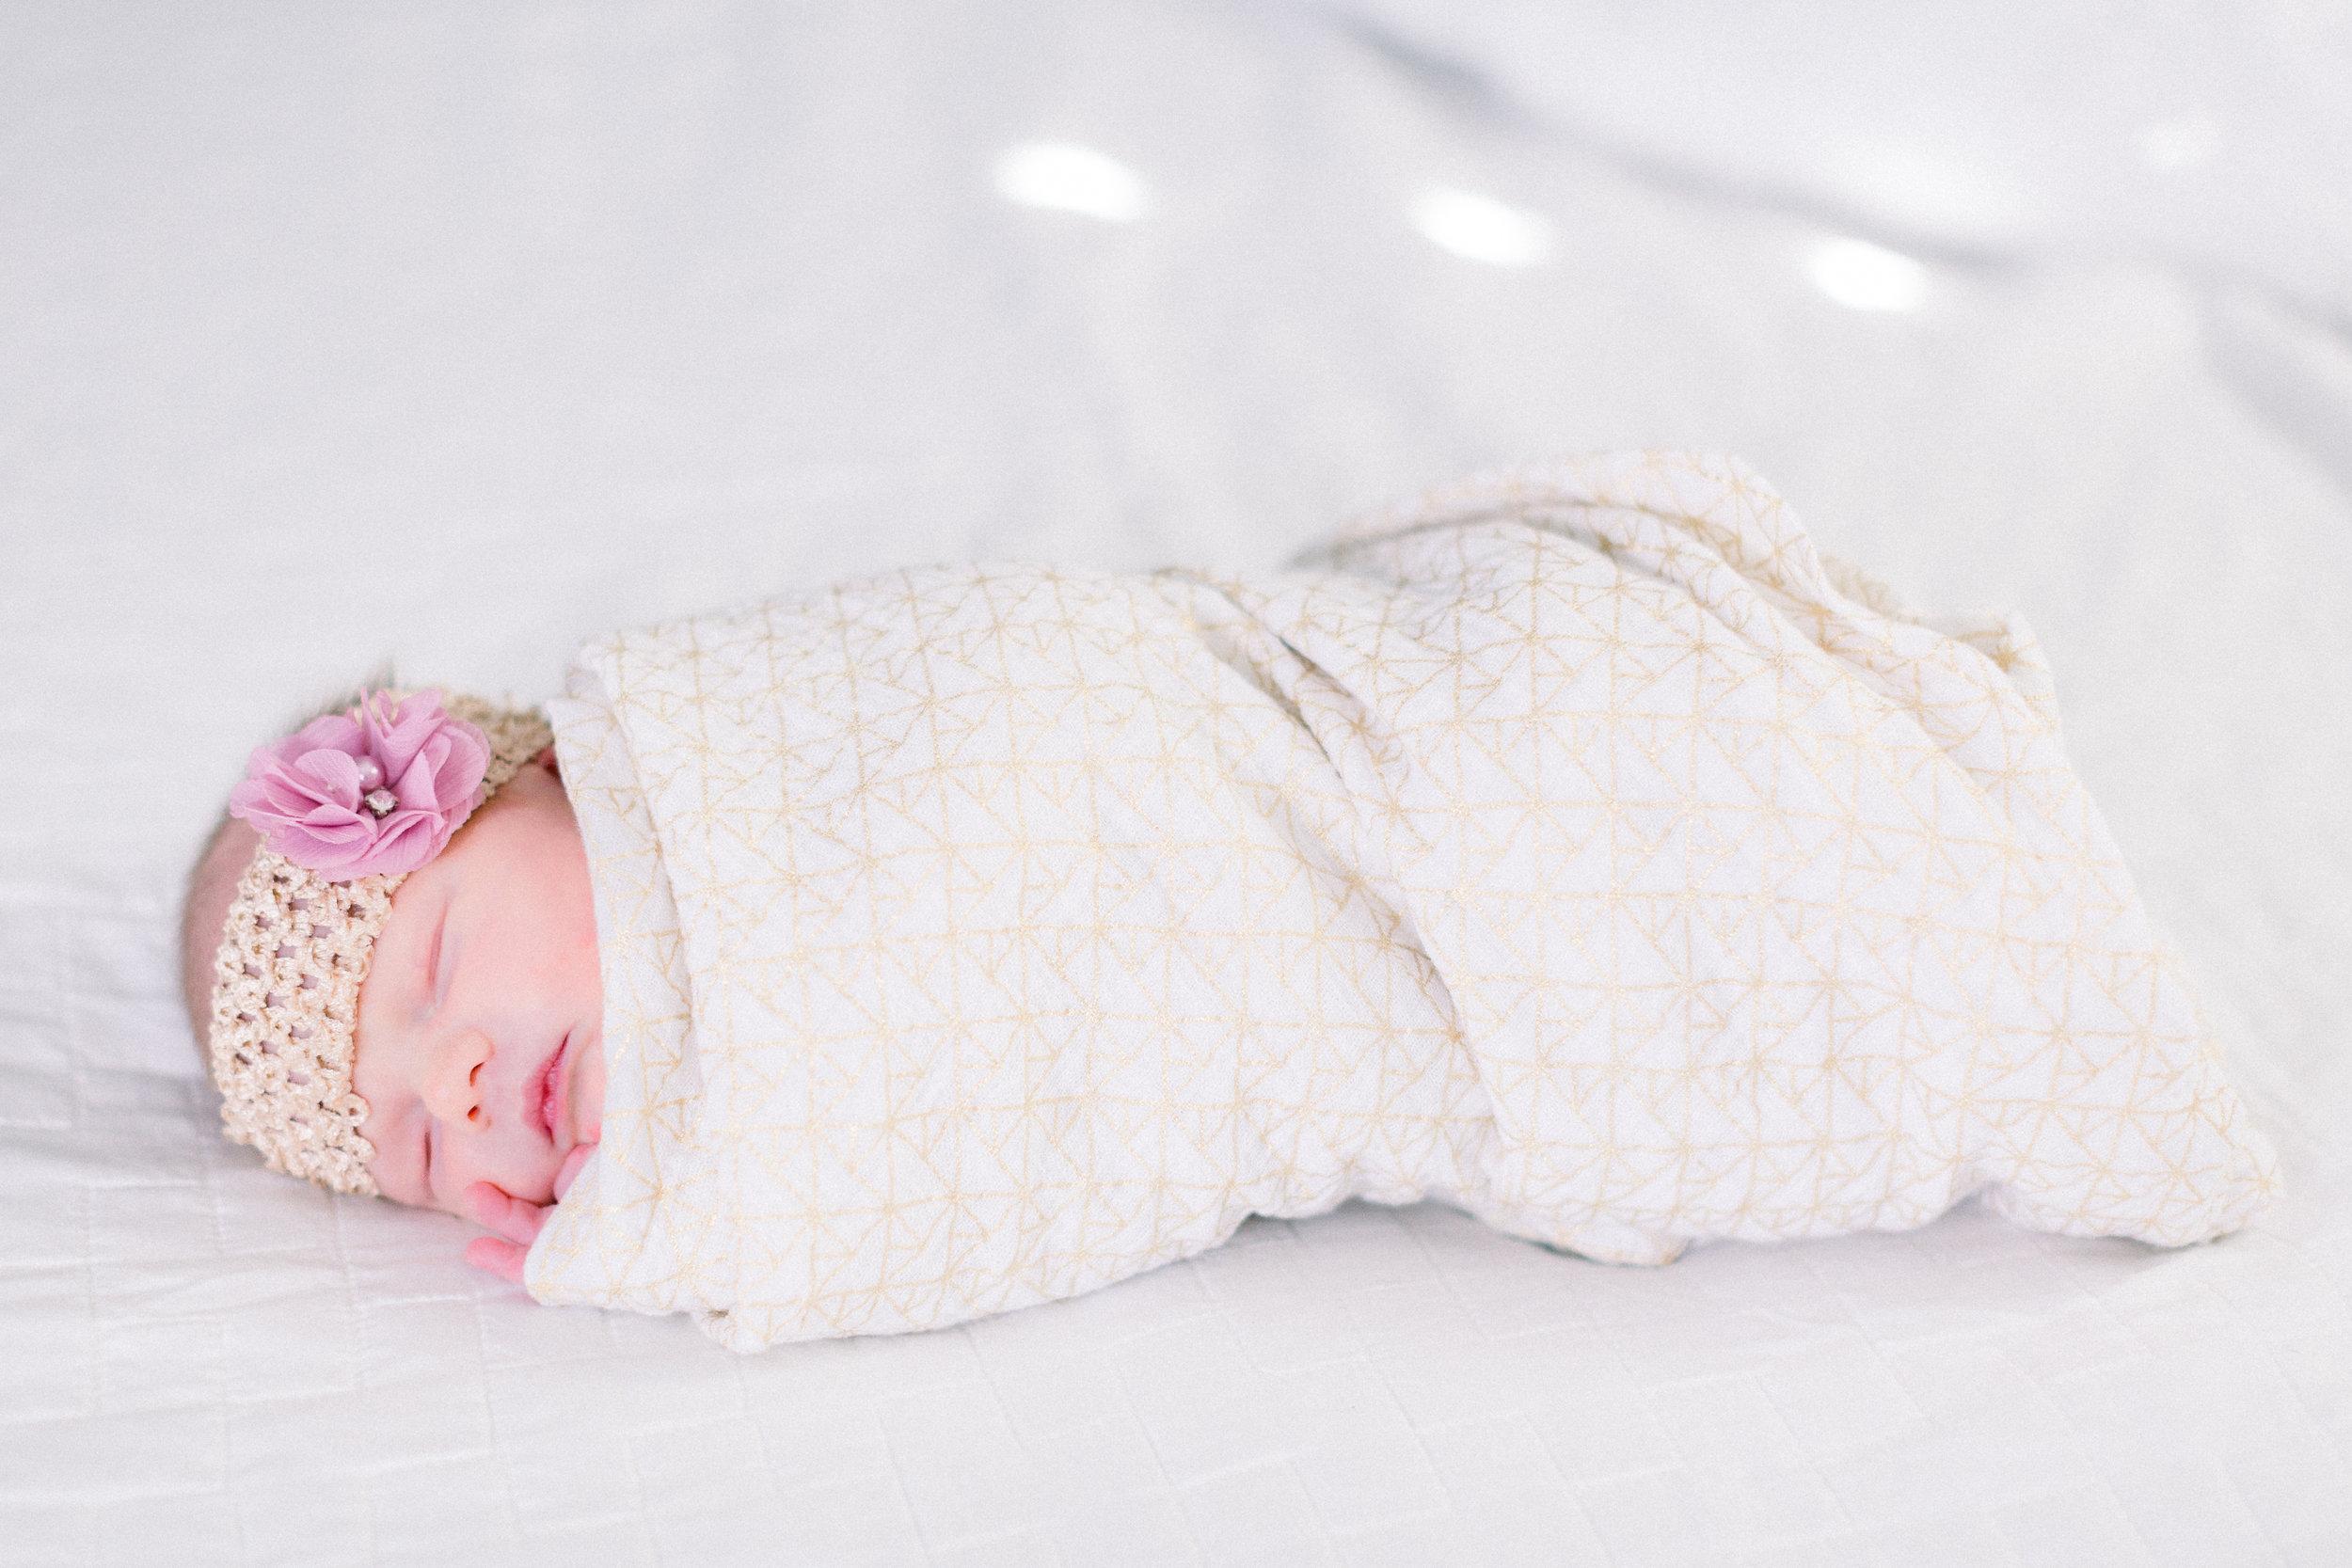 Chico-Lifestyle-Newborn-Film-Photography-Session-33.jpg